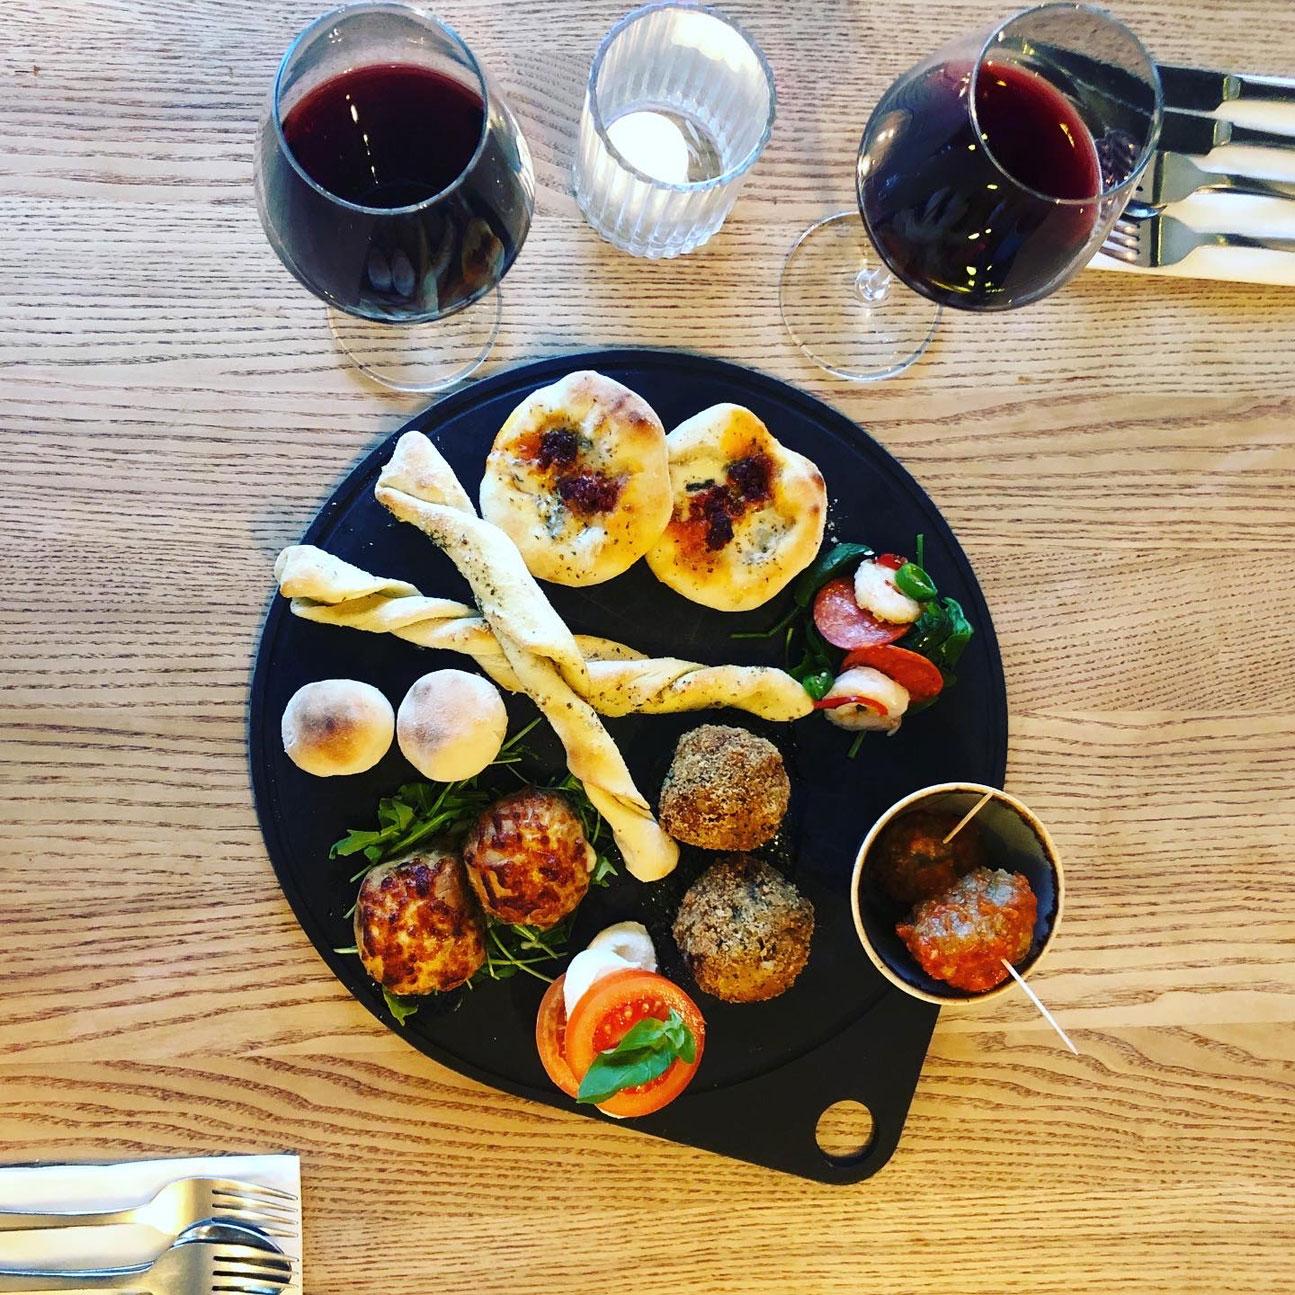 Breads + Mixed Platter | Pizza + Pasta Crewe | Gios Crewe | Cheshire